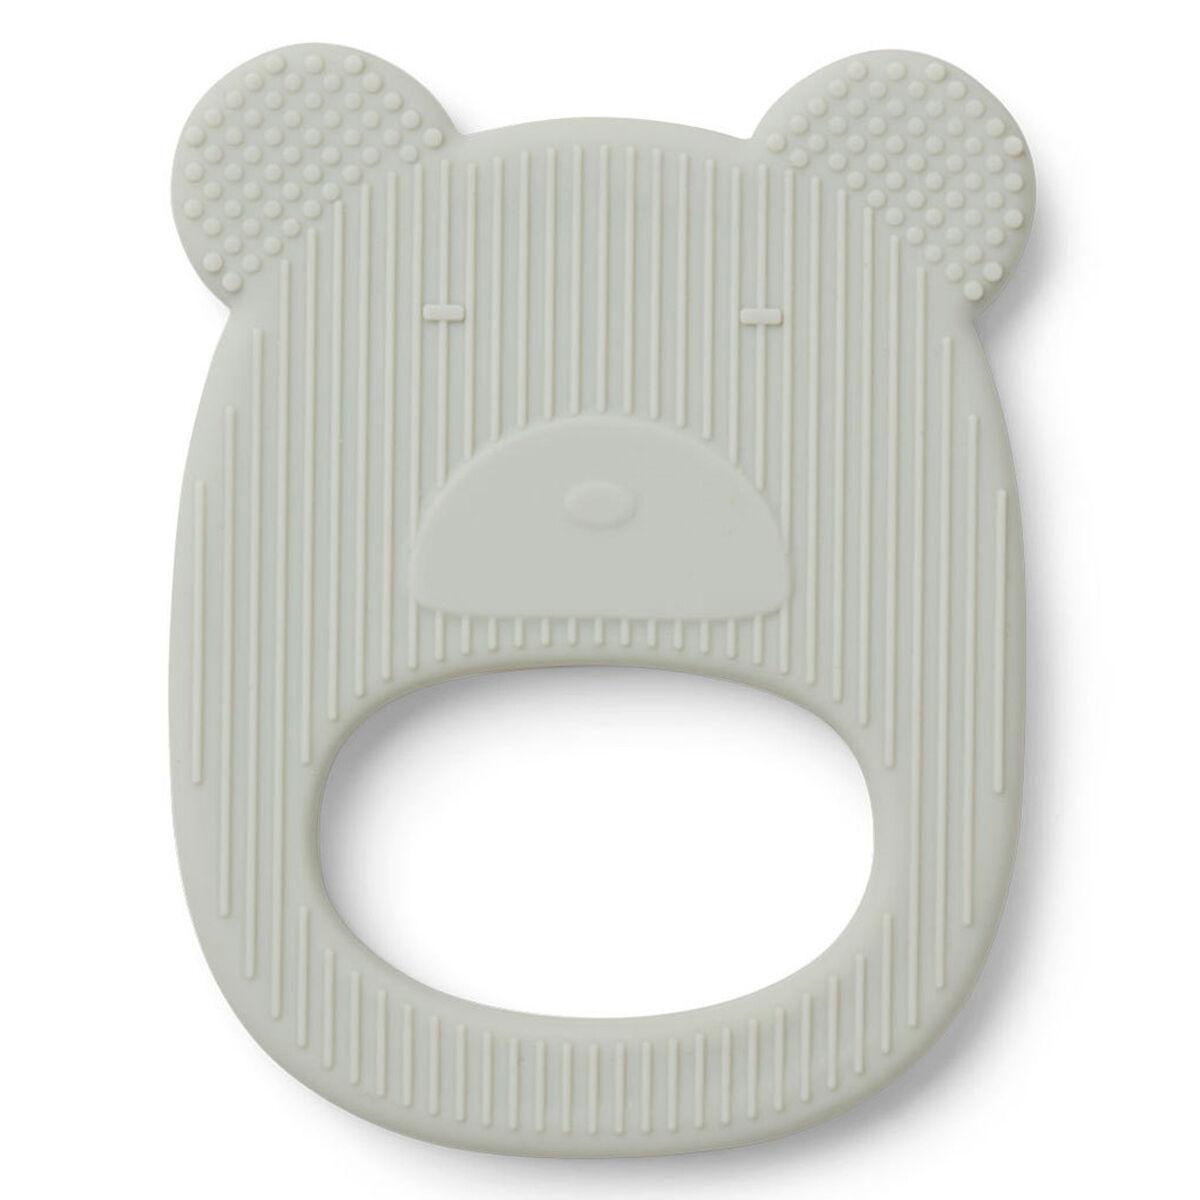 Liewood Anneau de Dentition Gemma Mr. Bear - Dusty Mint